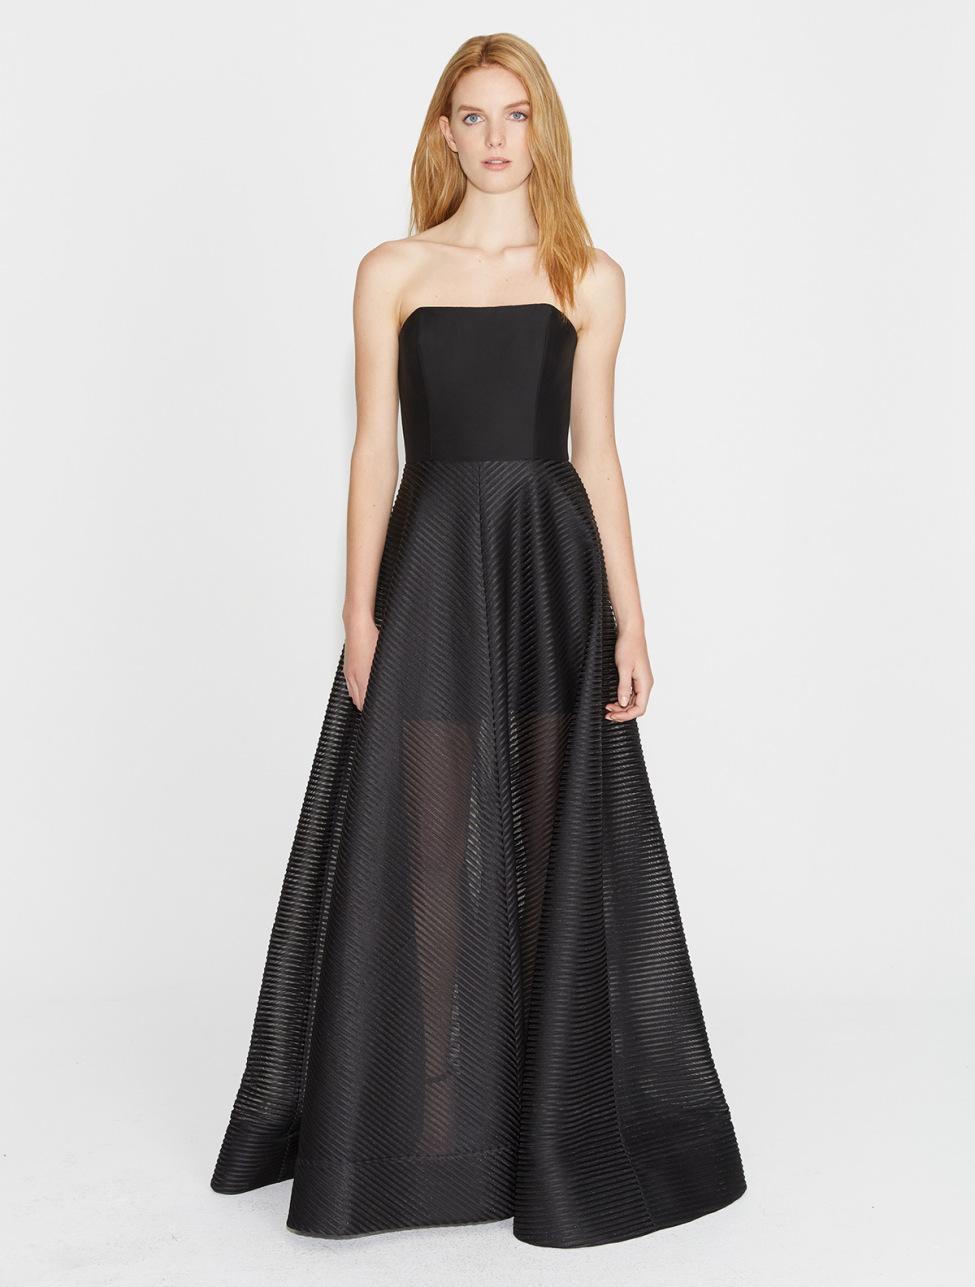 42f059acb2db Halston Strapless Stripe Mesh Gown in Black - Lyst